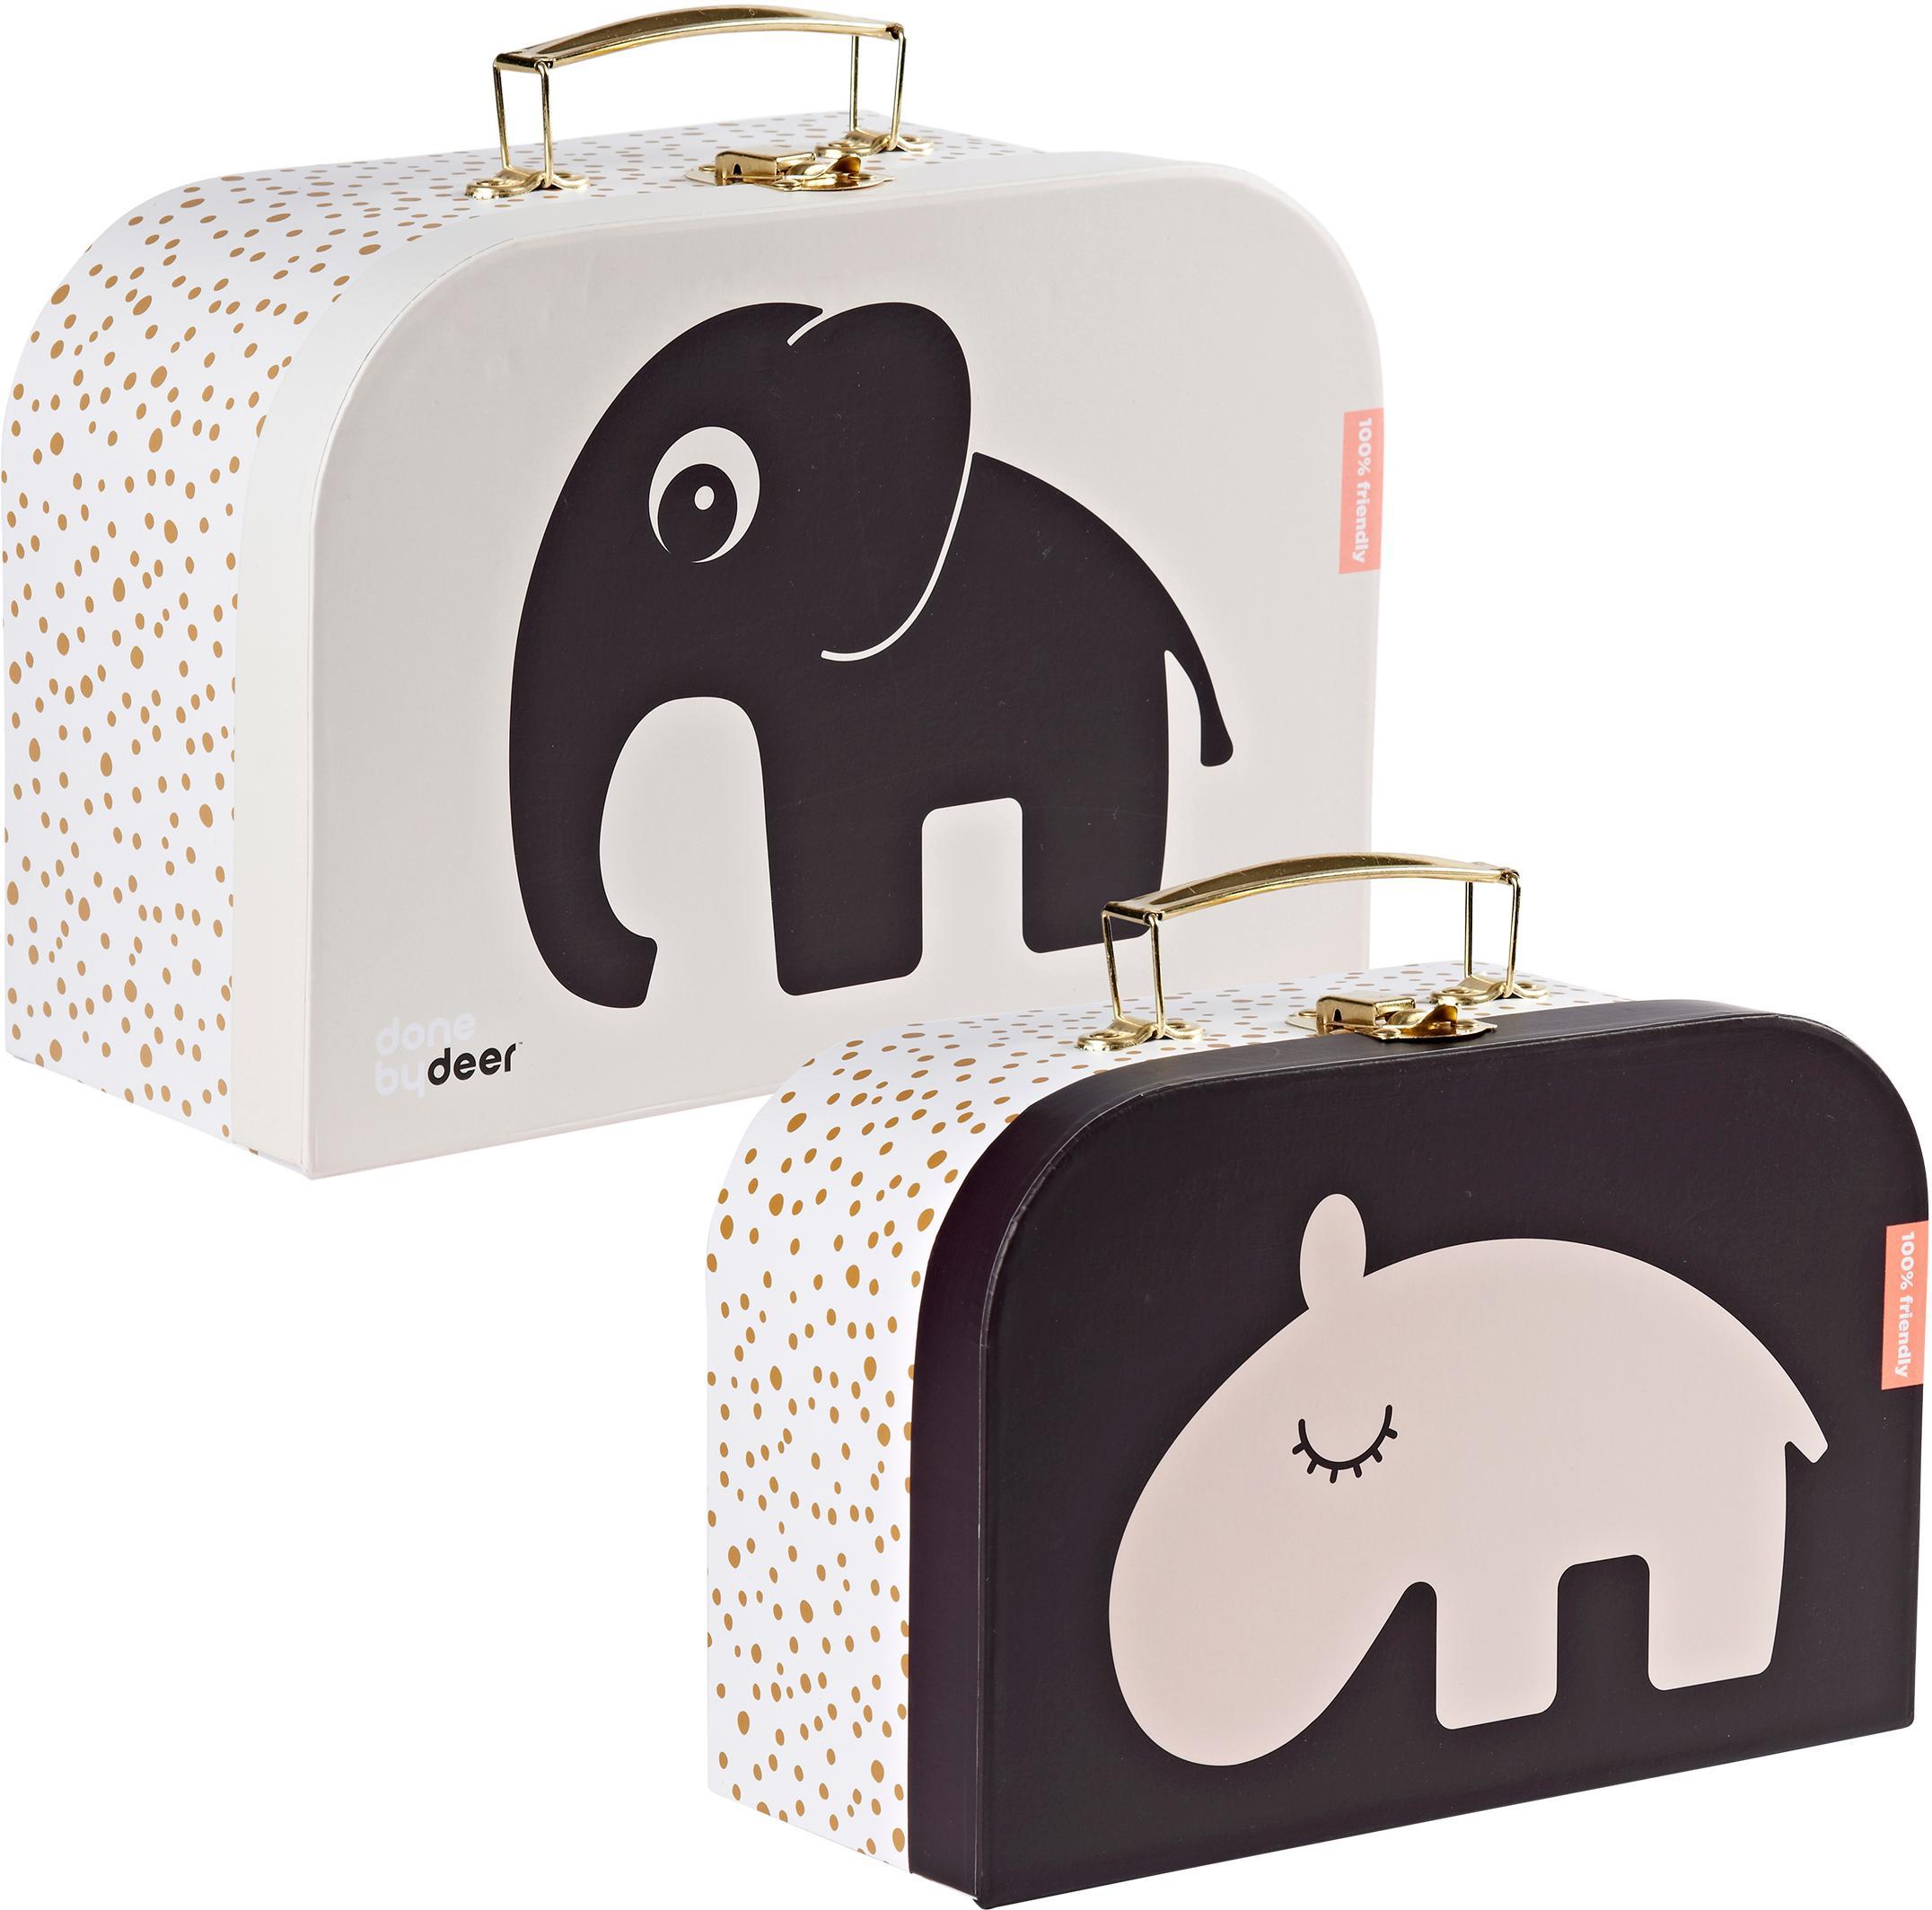 Set 2 valigie per bambini Deer Friends, Custodia: cartone laminato, Manico: metallo rivestito, Rosa, Set in varie misure